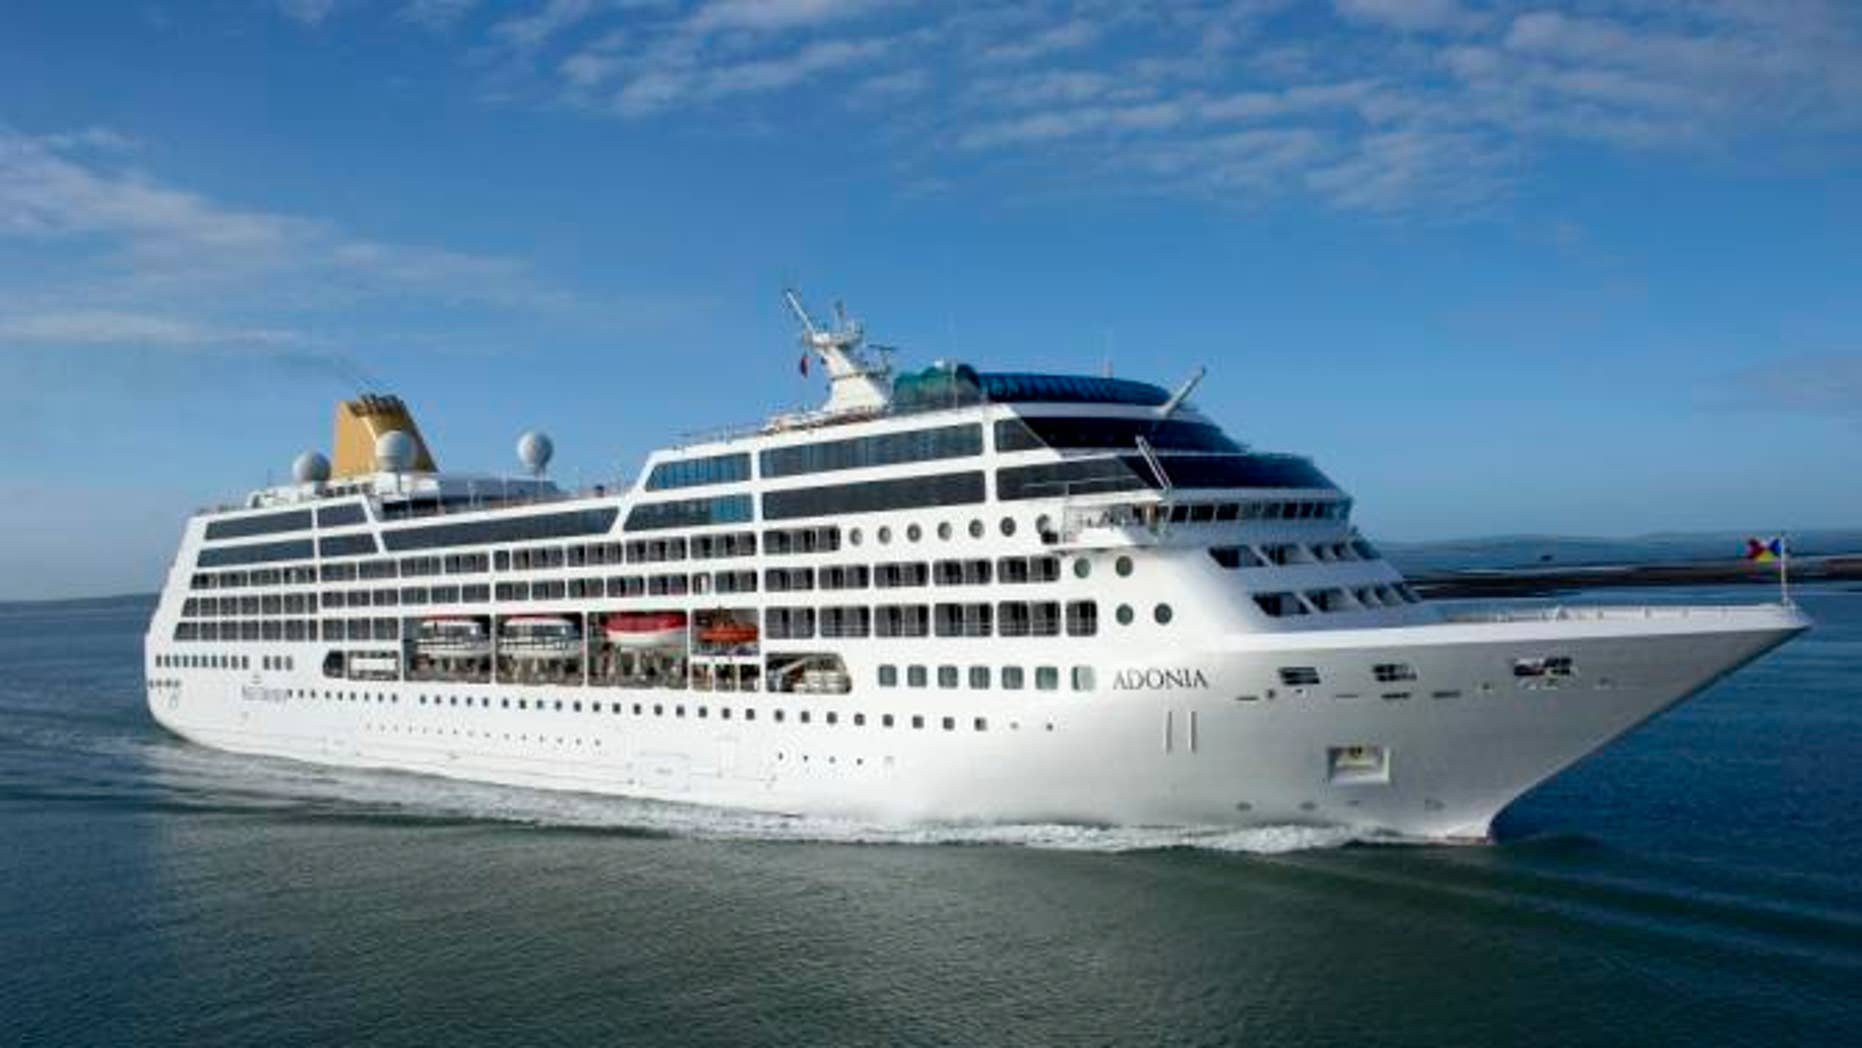 The 704passenger Adonia ship will start sailing from Miami to Cuba May 1, 2016.